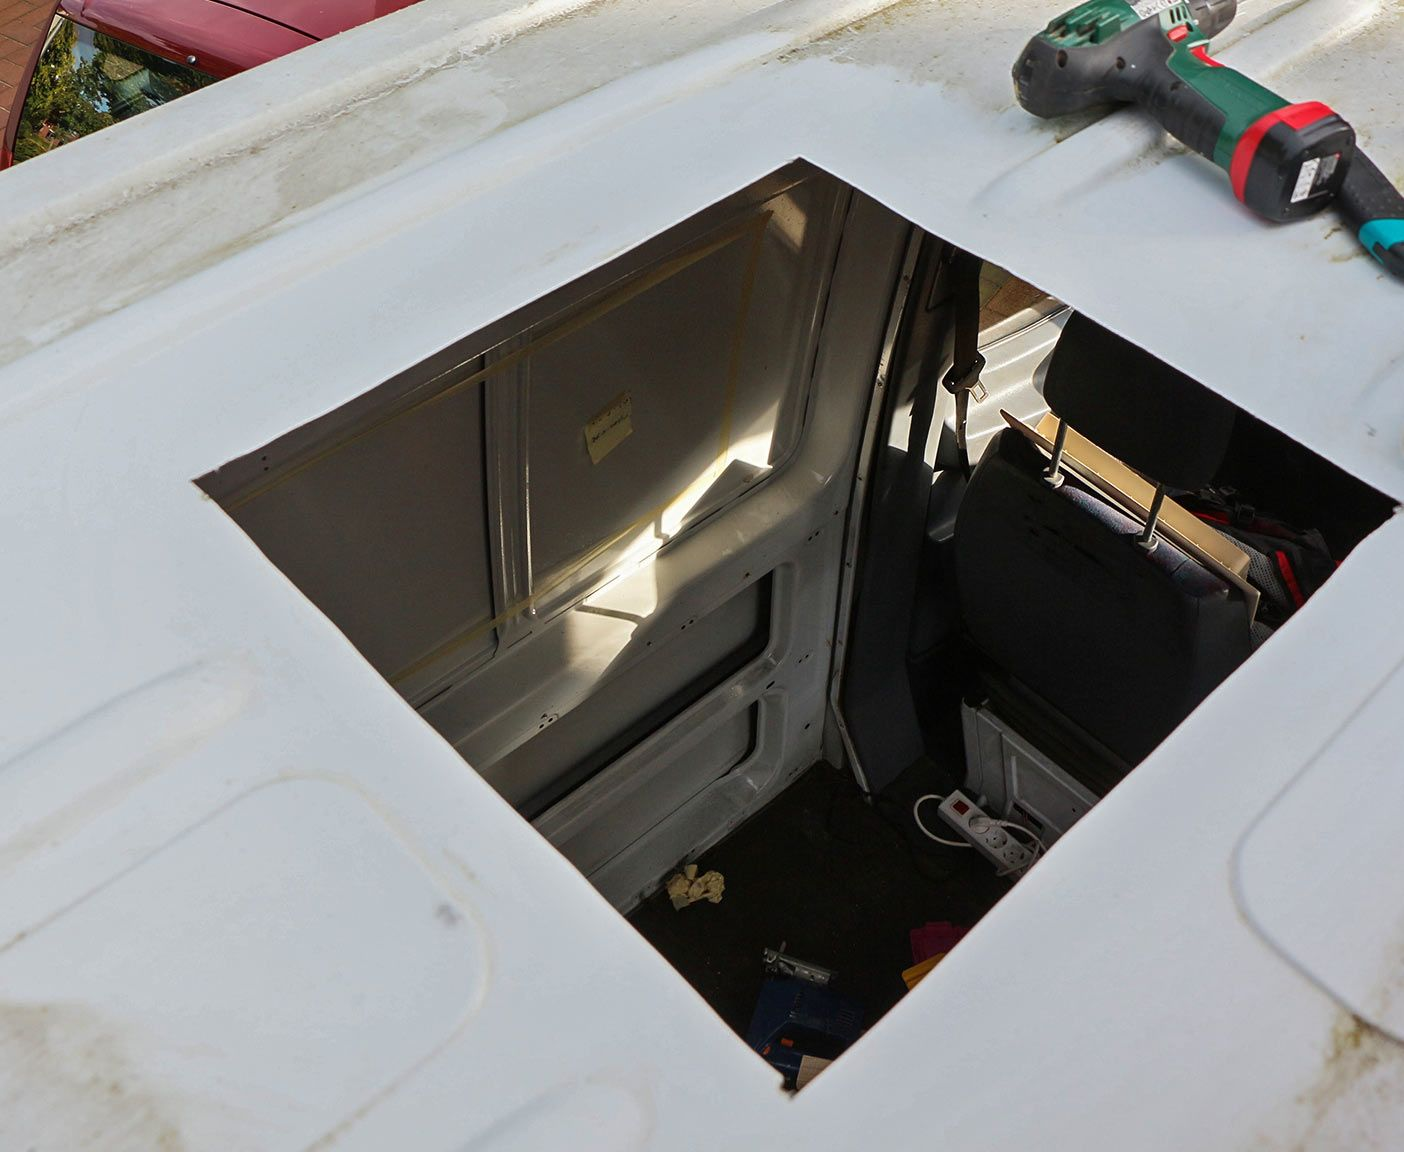 Wohnmobil Dachluke Dachfenster Selber Einbauen Dachluke